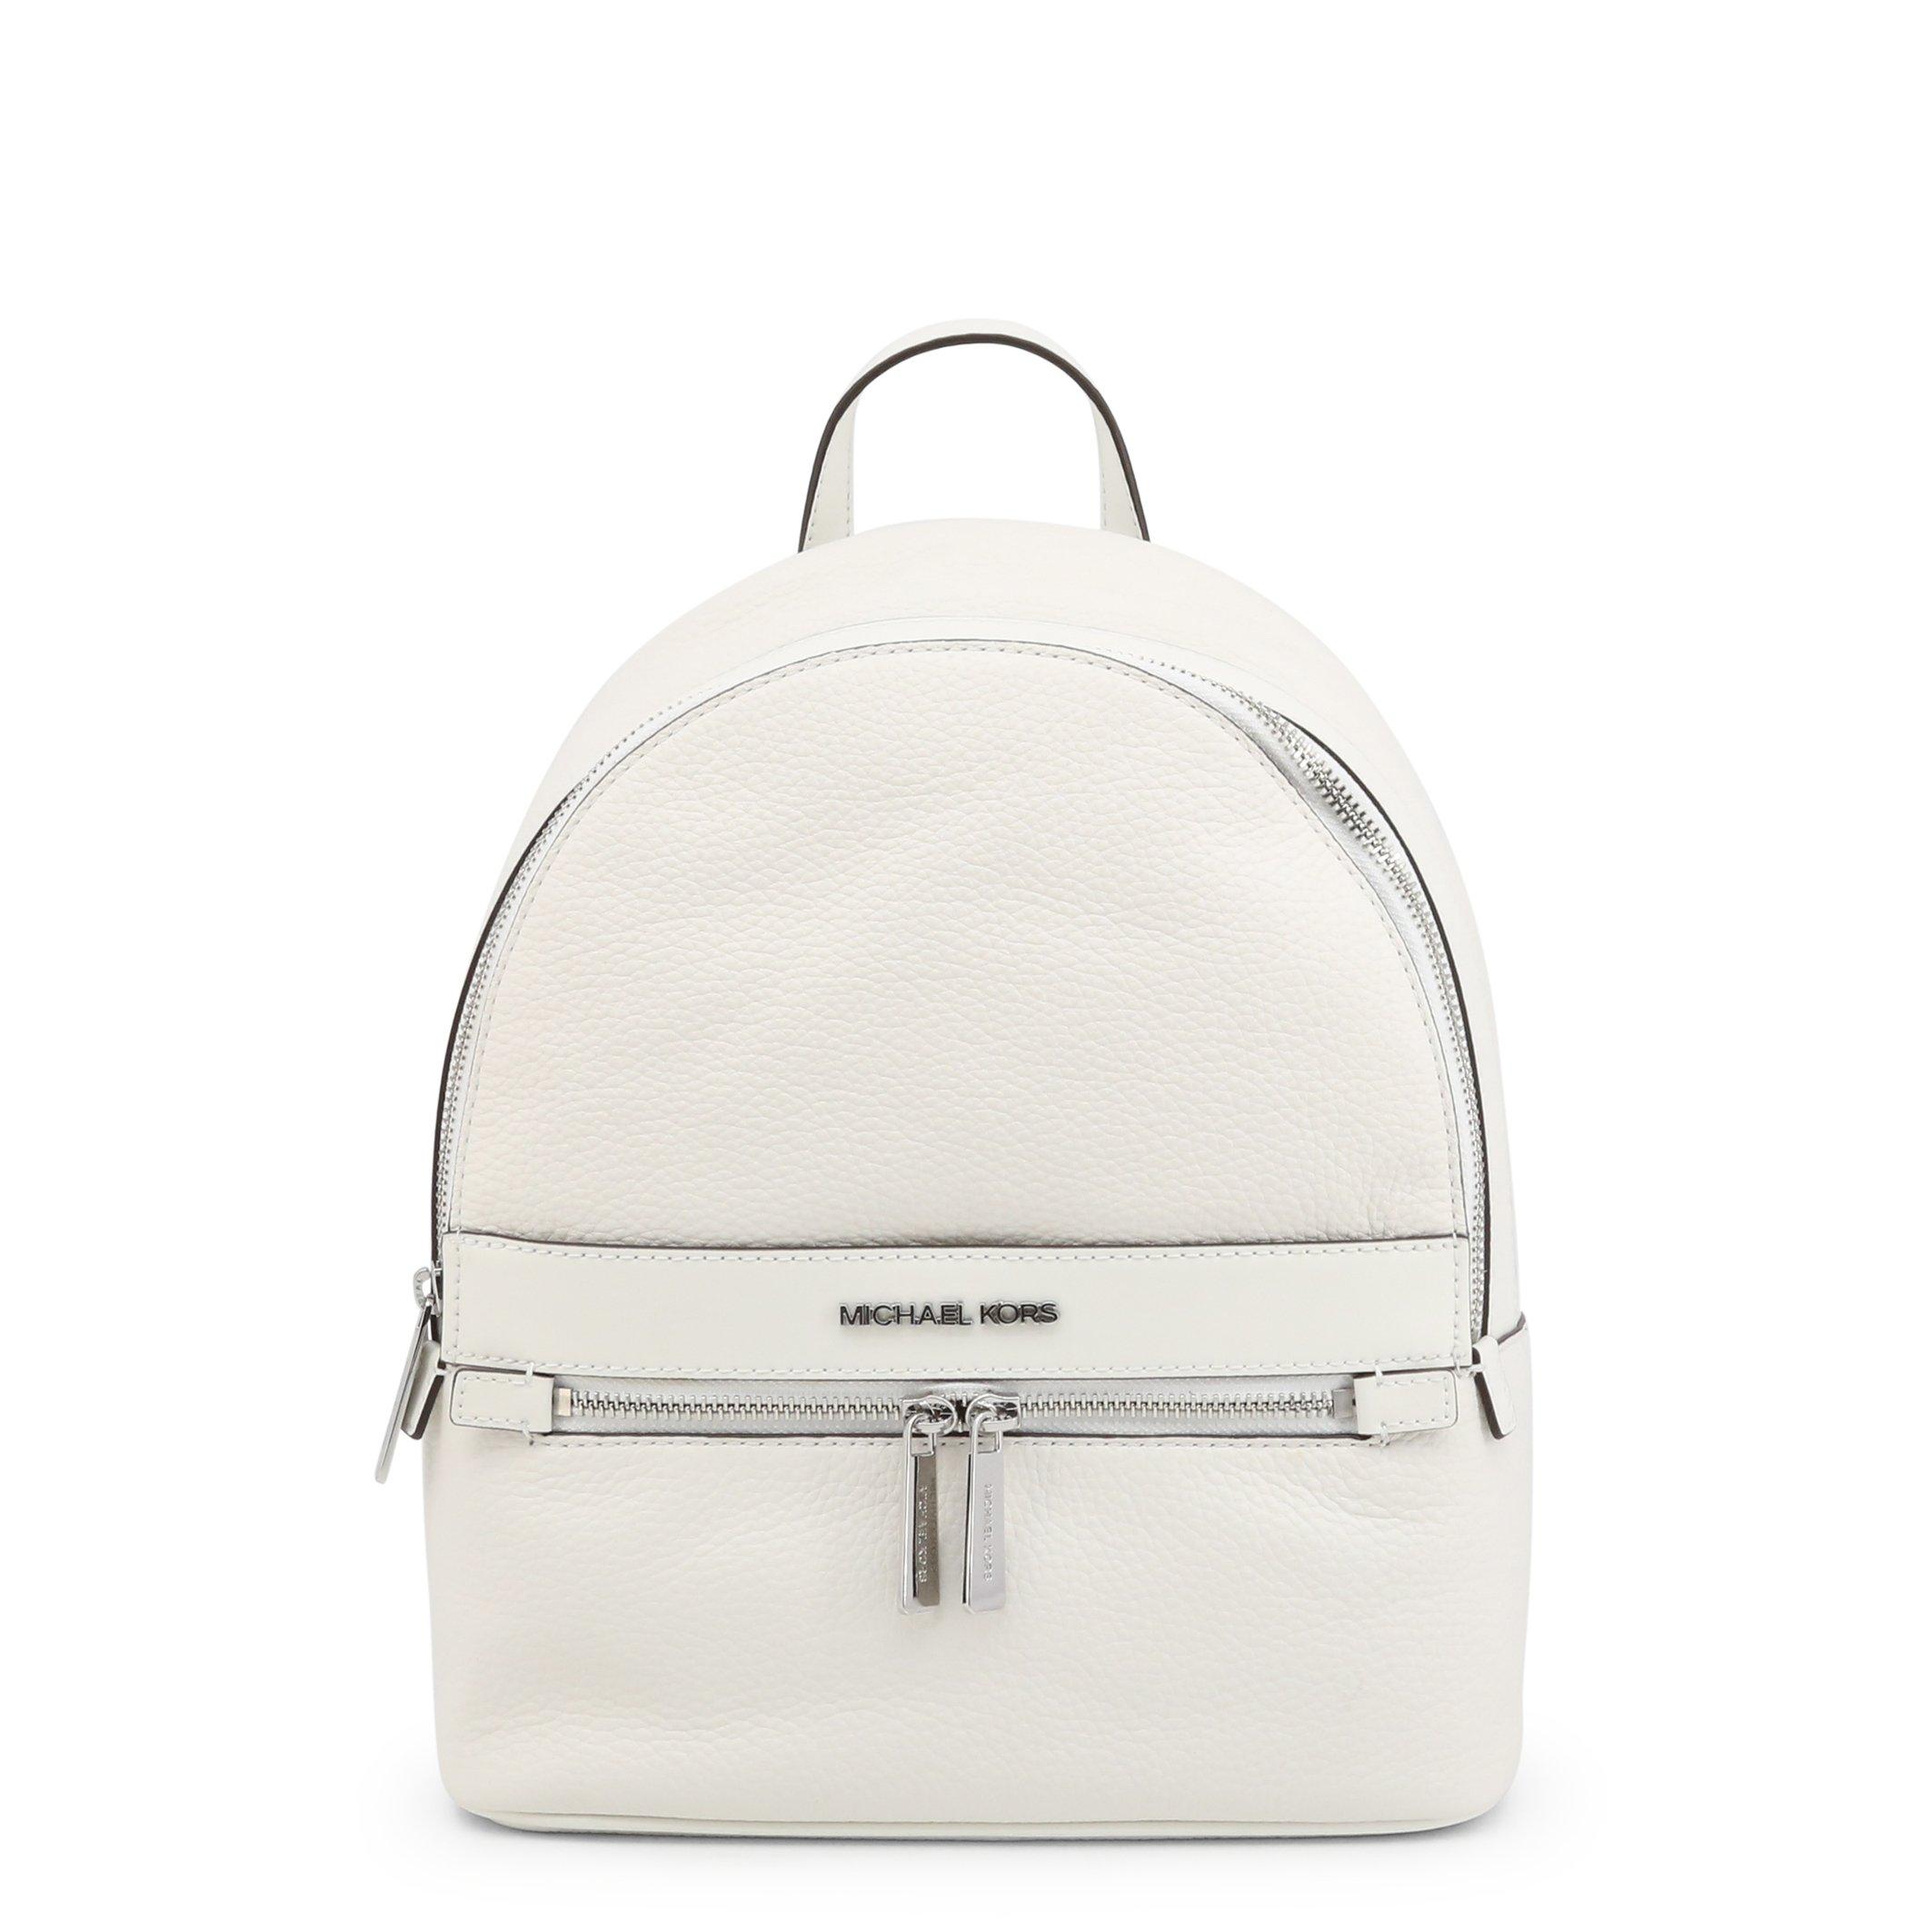 Michael Kors Women's Backpack Various Colours KENLY_35S0SY9B2L - white NOSIZE